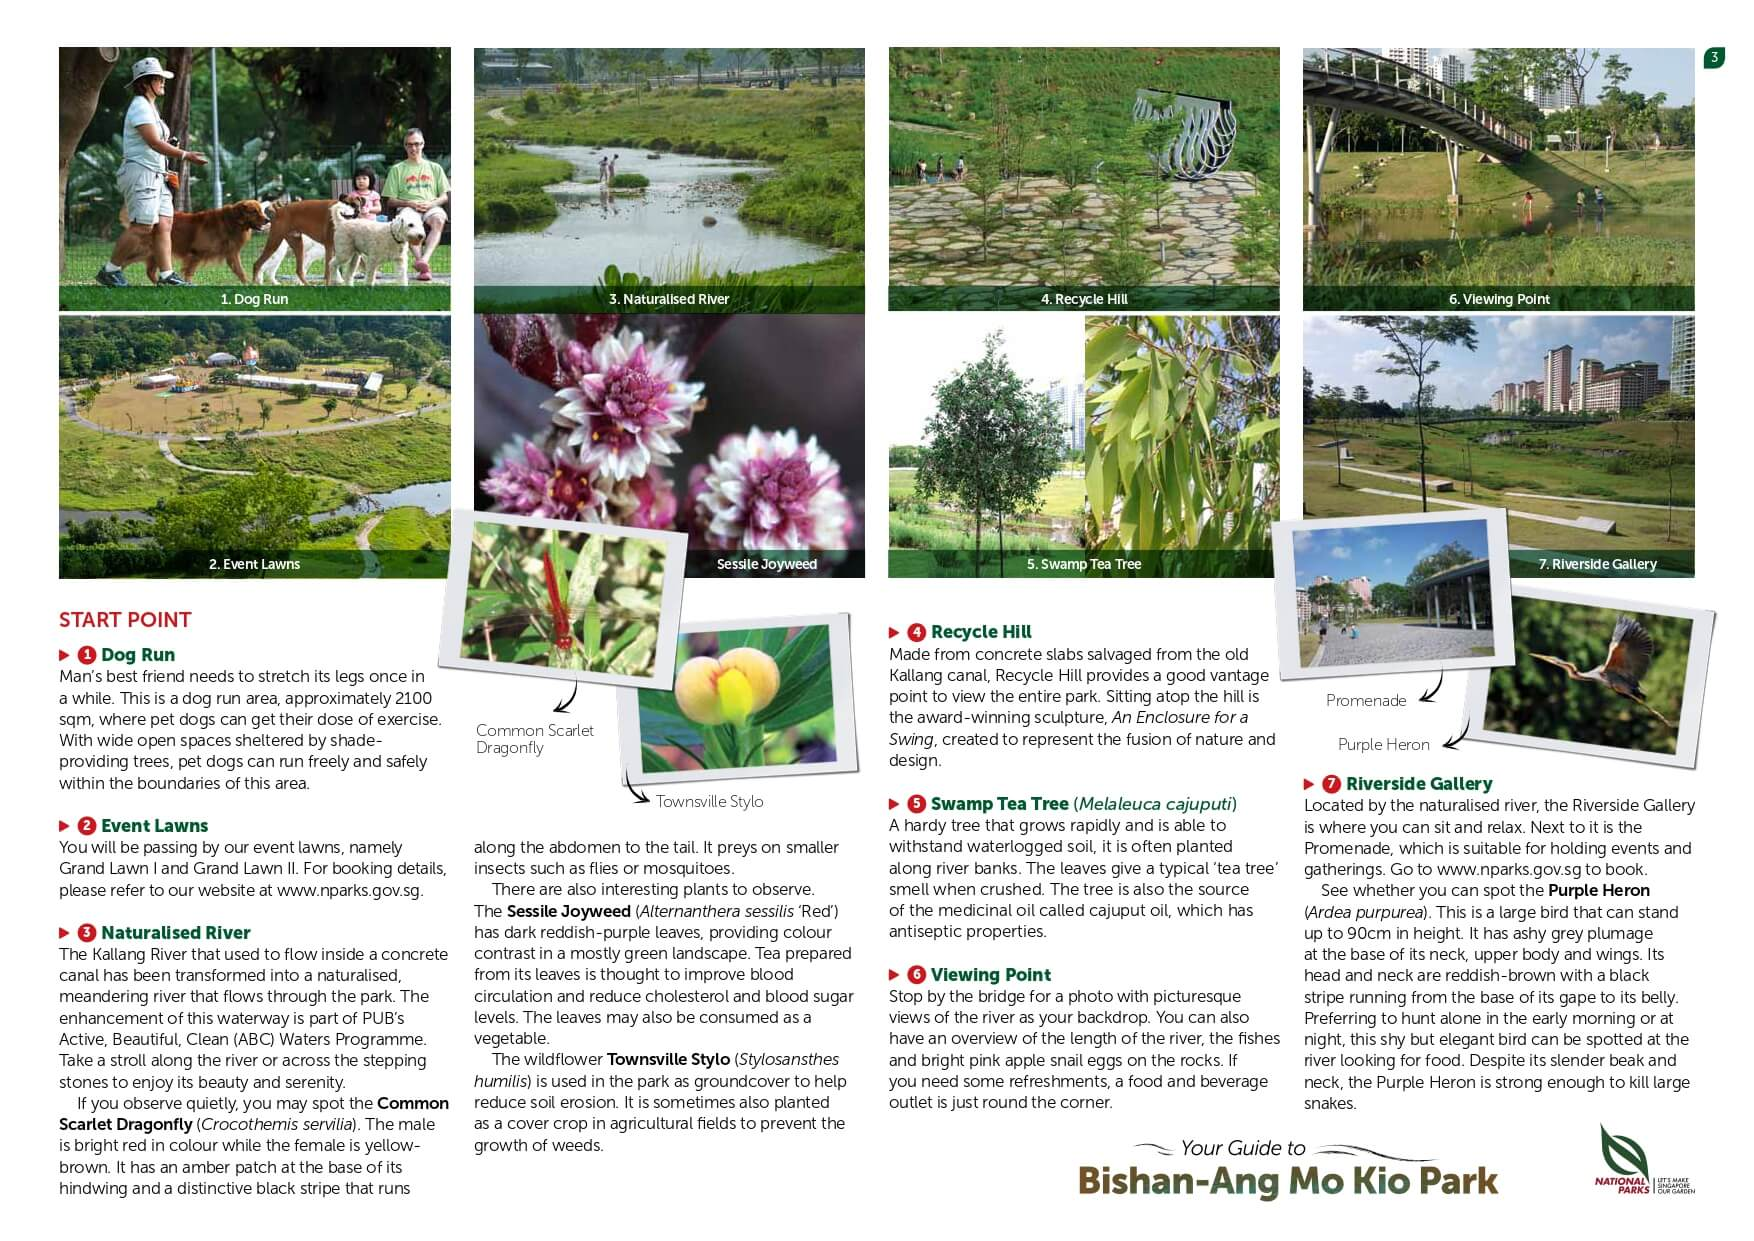 bishan amk park page 3